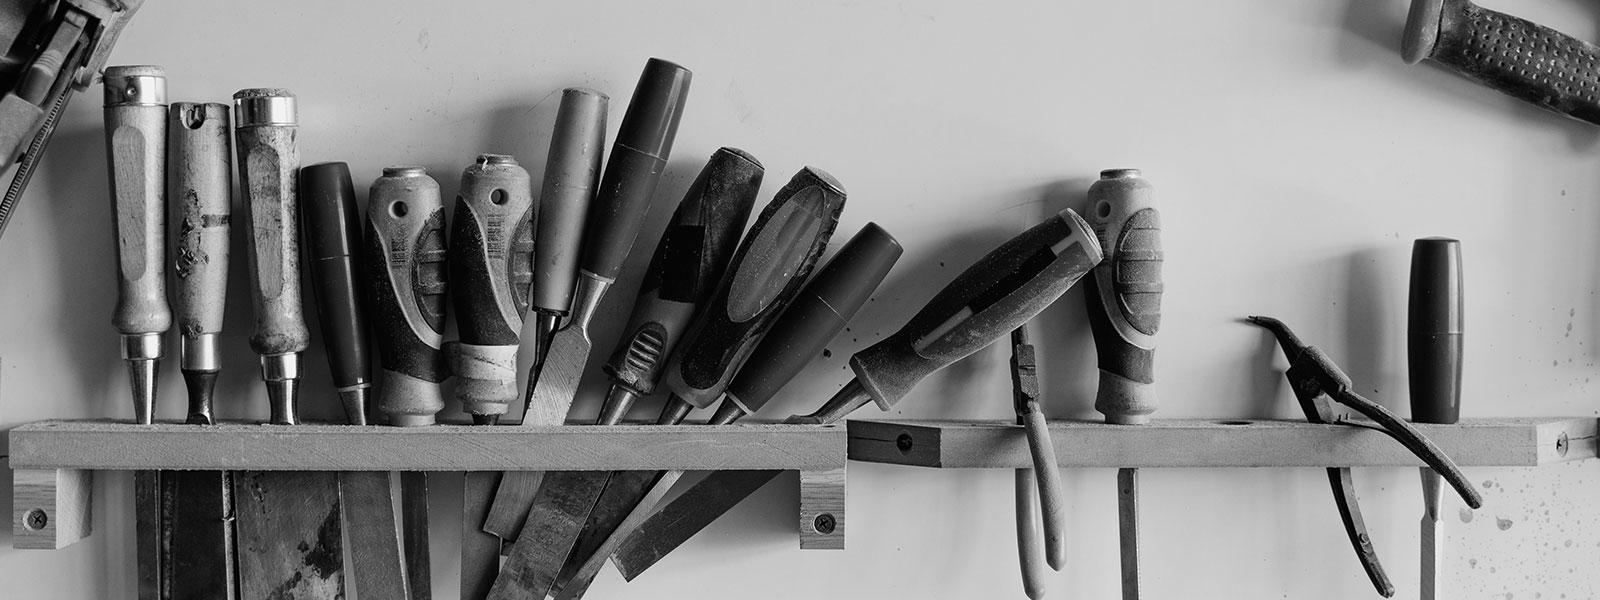 Tradesman's tools